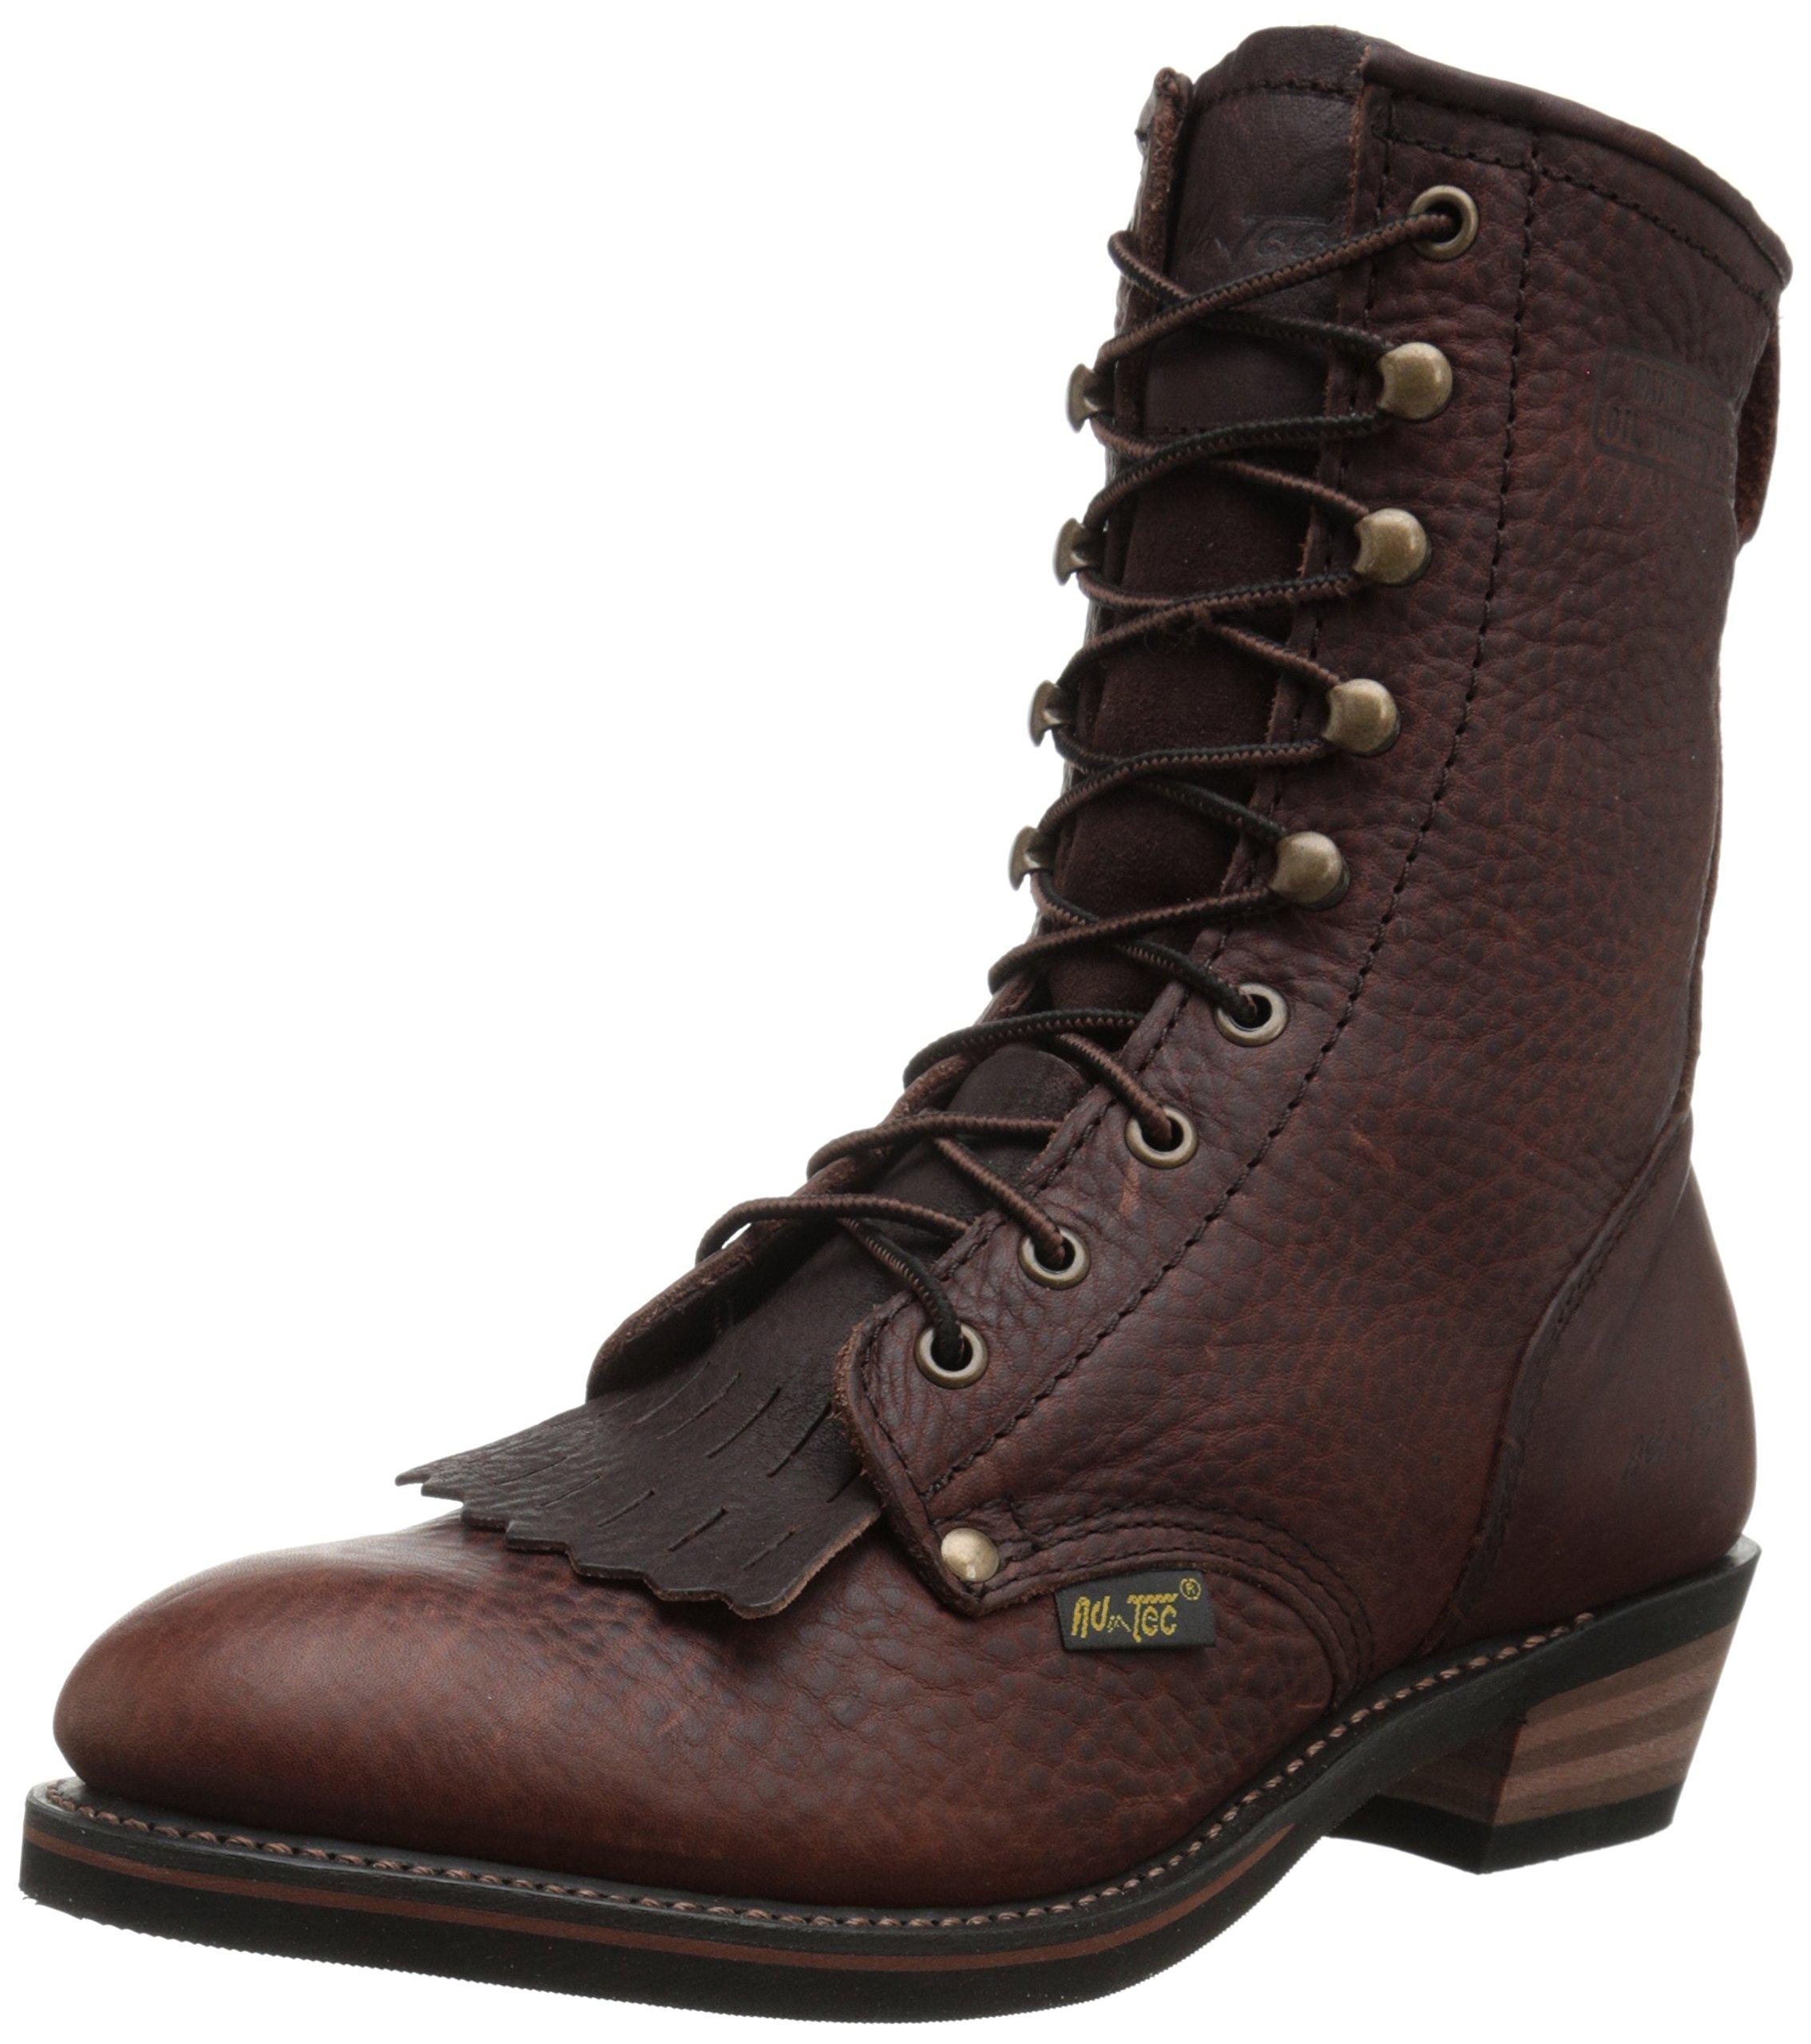 Adtec Men's 9 Inch Packer Boot, Chestnut, 12 M US